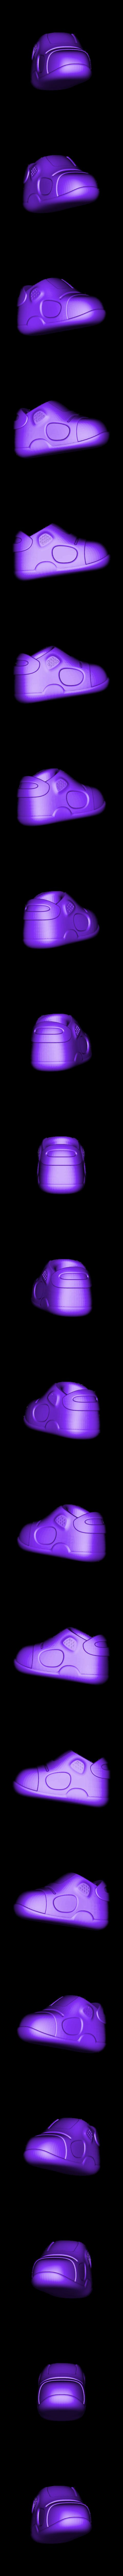 _Taipei_Lantern_Festival_7.STL Download free STL file 2017 台北燈節 / Taipei Lantern Festival • 3D printer template, 86Duino